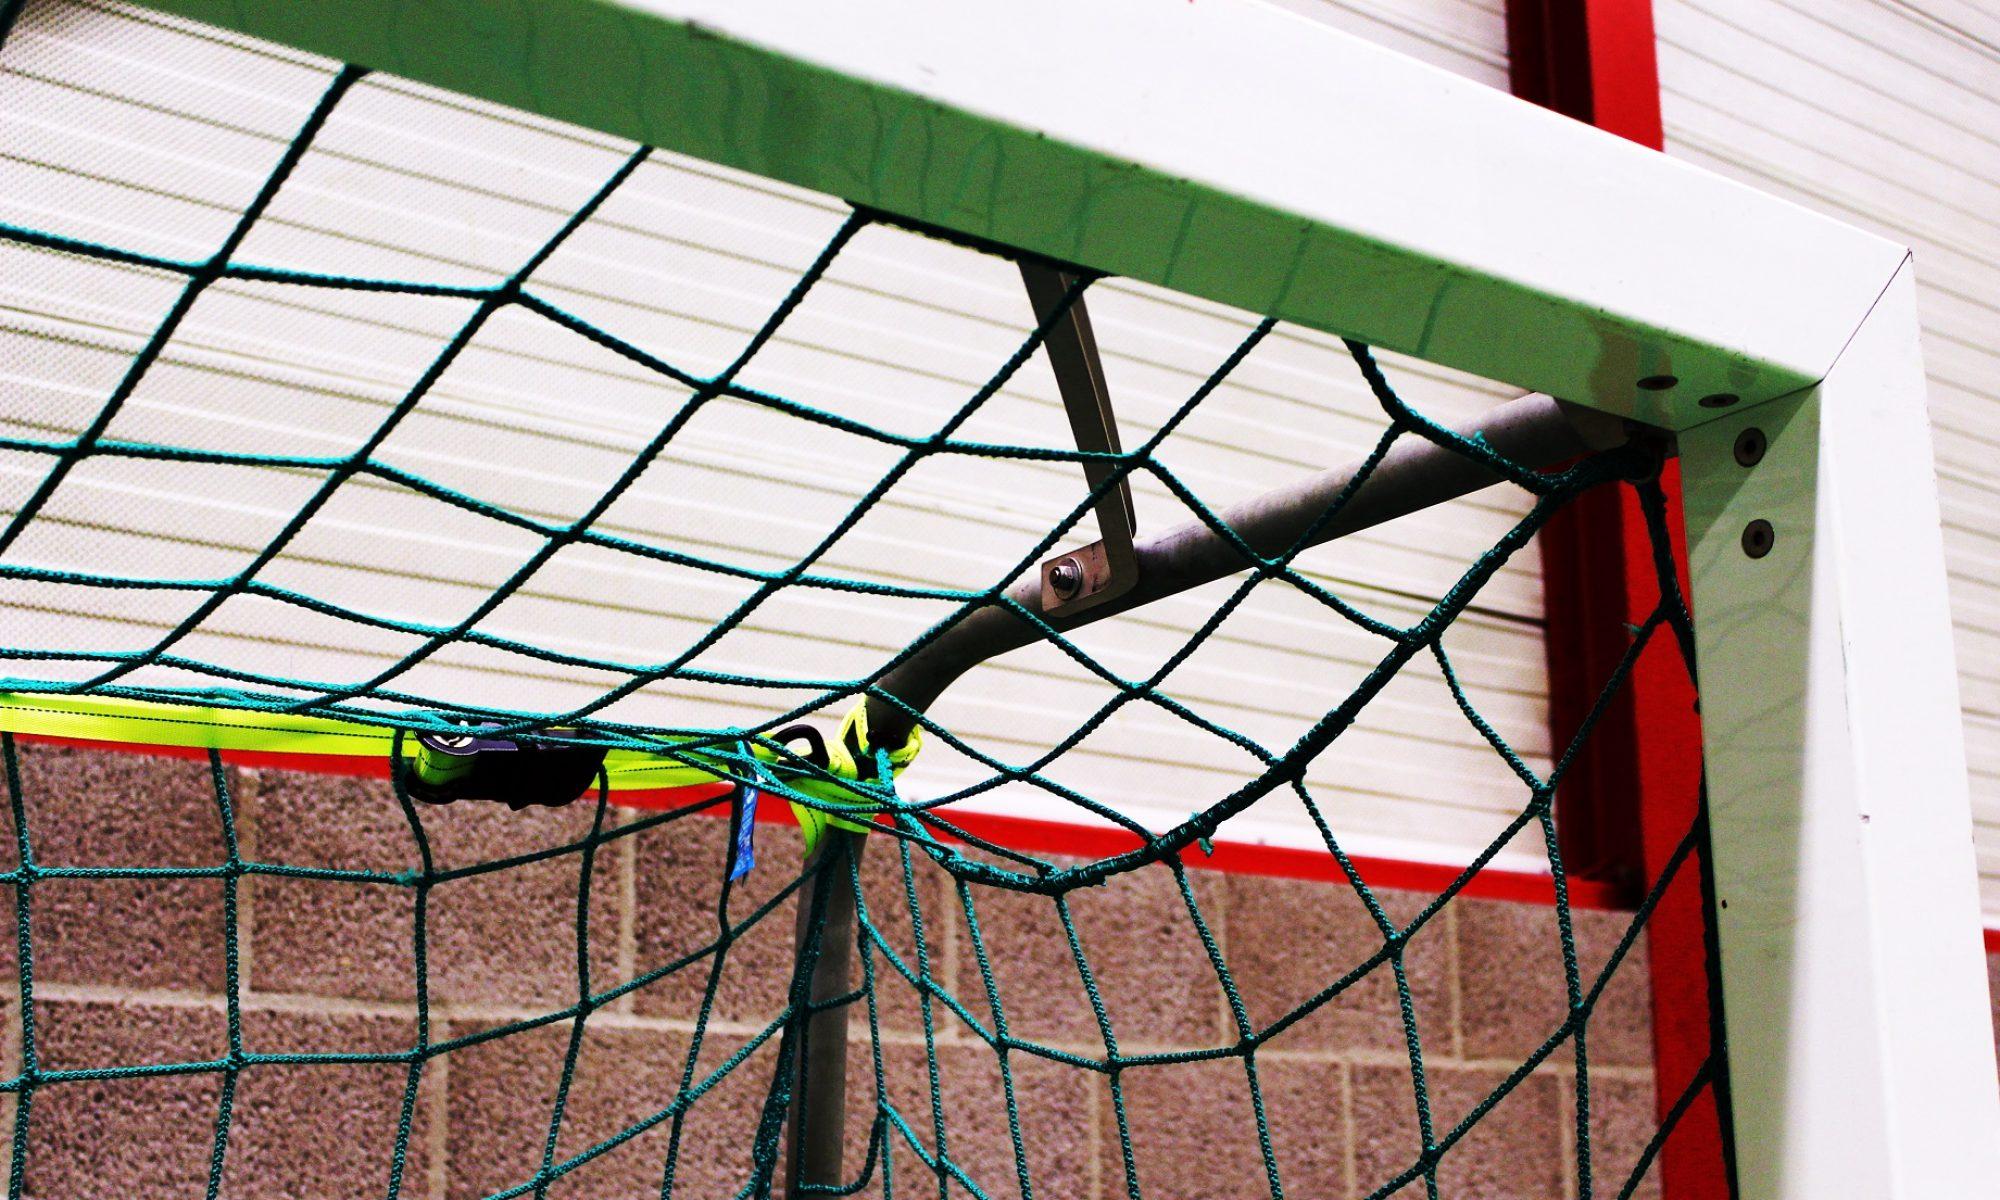 Sporthal de Koeweide